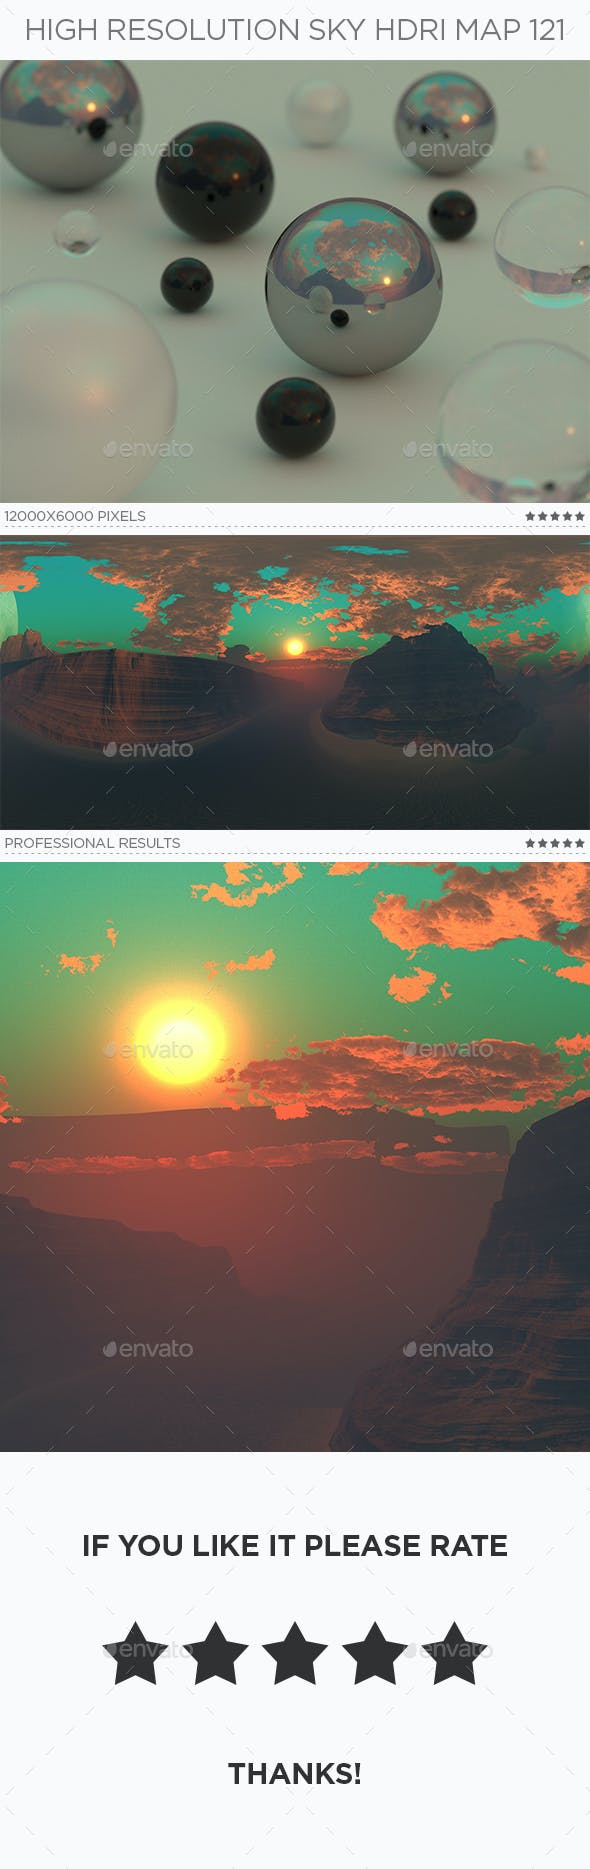 High Resolution Sky HDRi Map 121 - 3DOcean Item for Sale